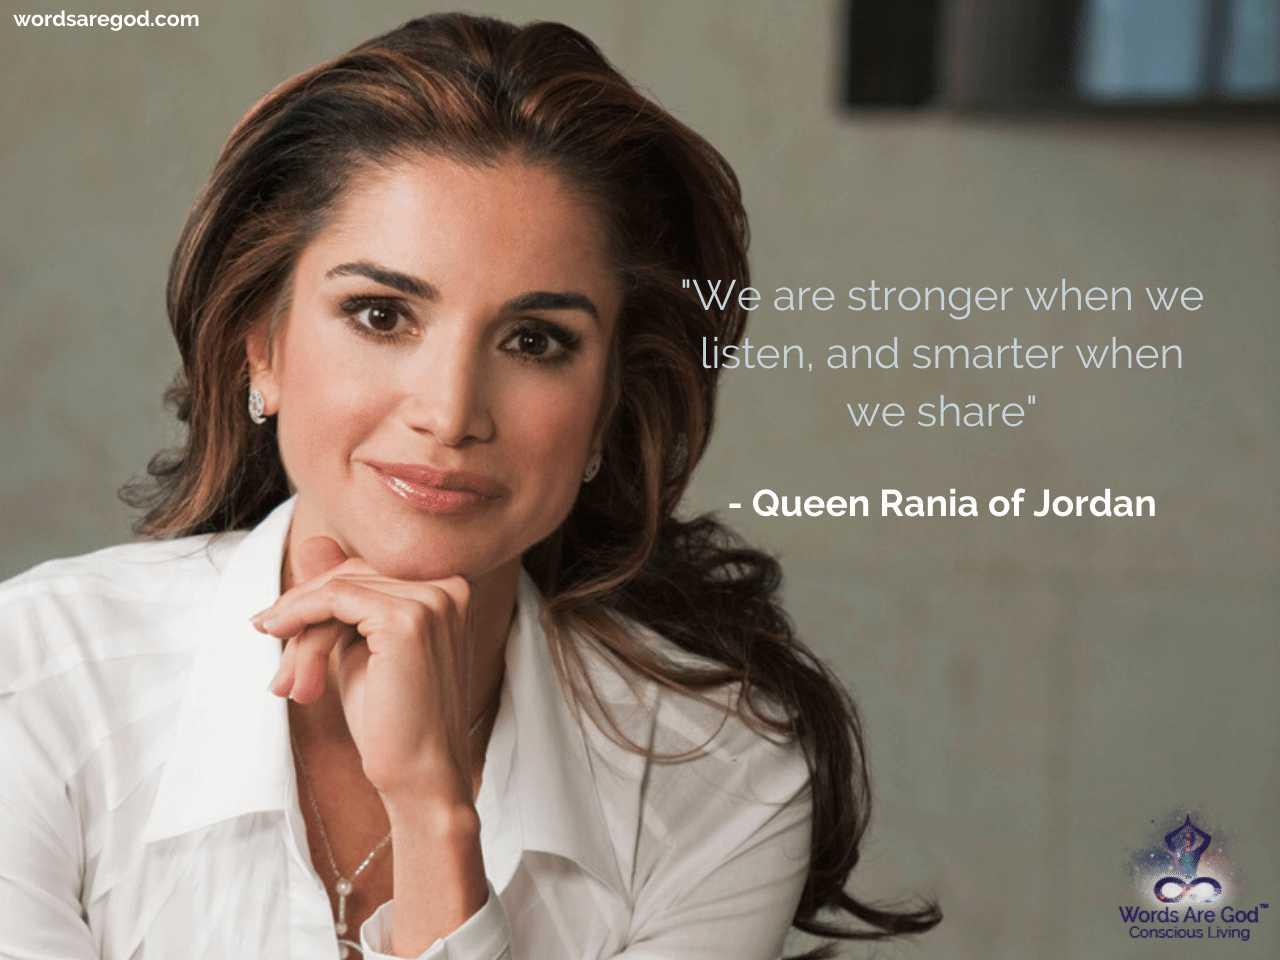 Queen Rania of Jordan Motivational Quote by Queen Rania of Jordan